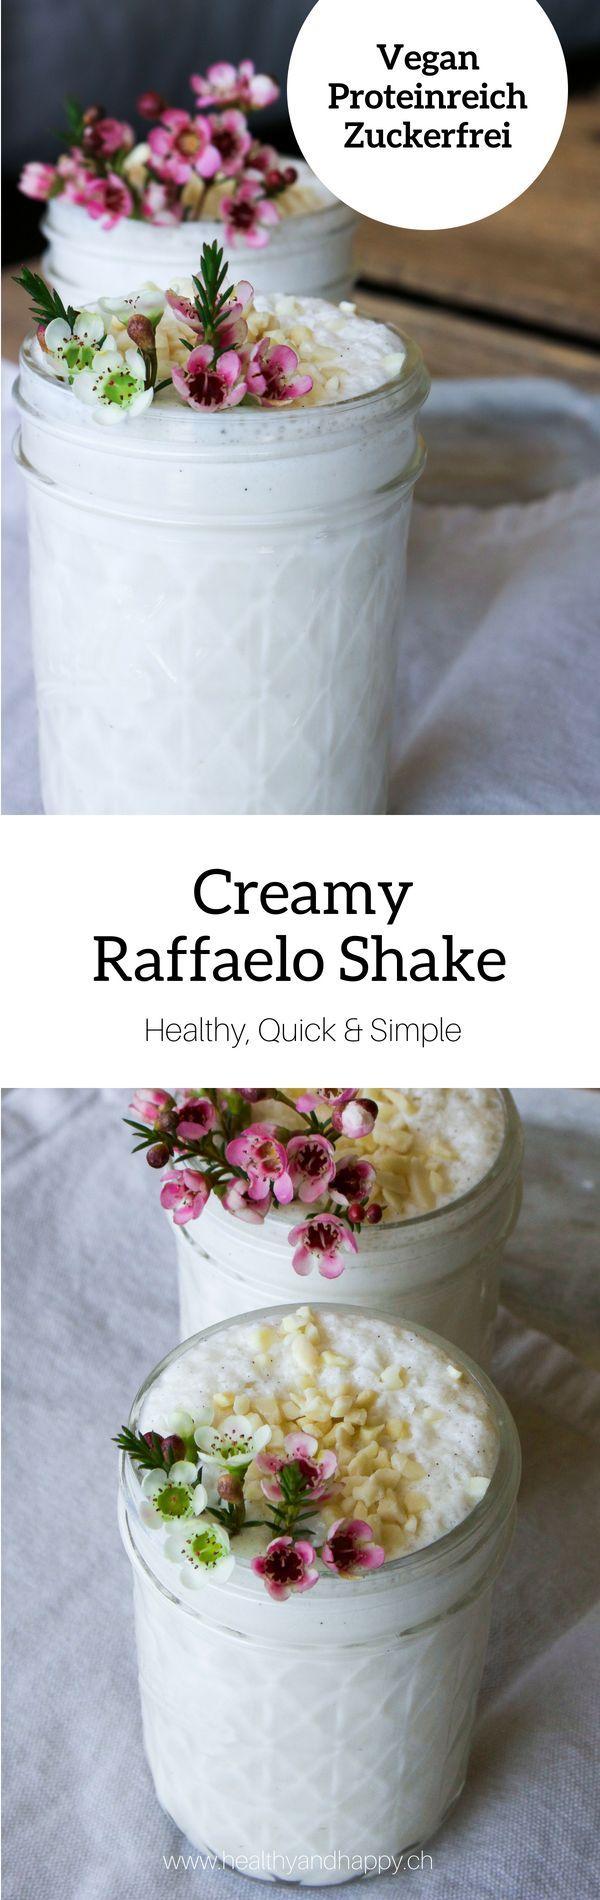 1. Summer Edition Shake: Raffaello